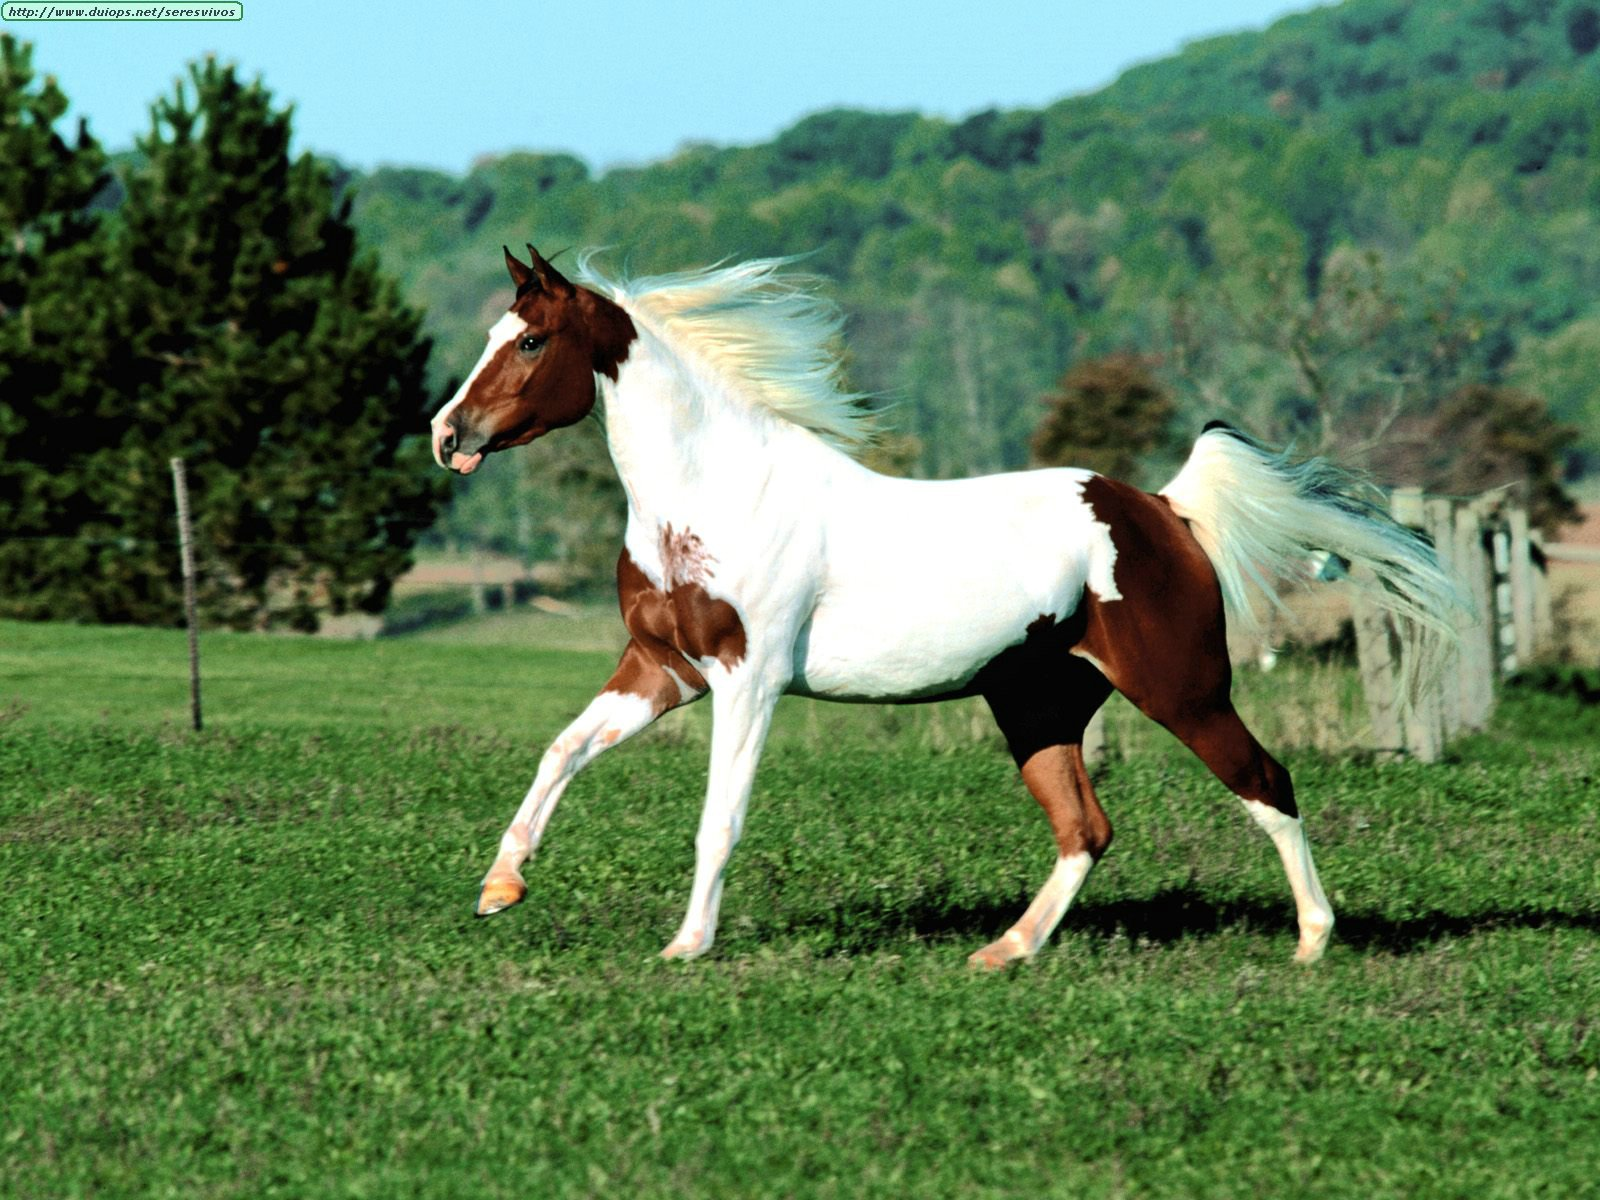 http://www.duiops.net/seresvivos/galeria/caballos/Animals%20Horses_Arab%20X%20Pinto.jpg